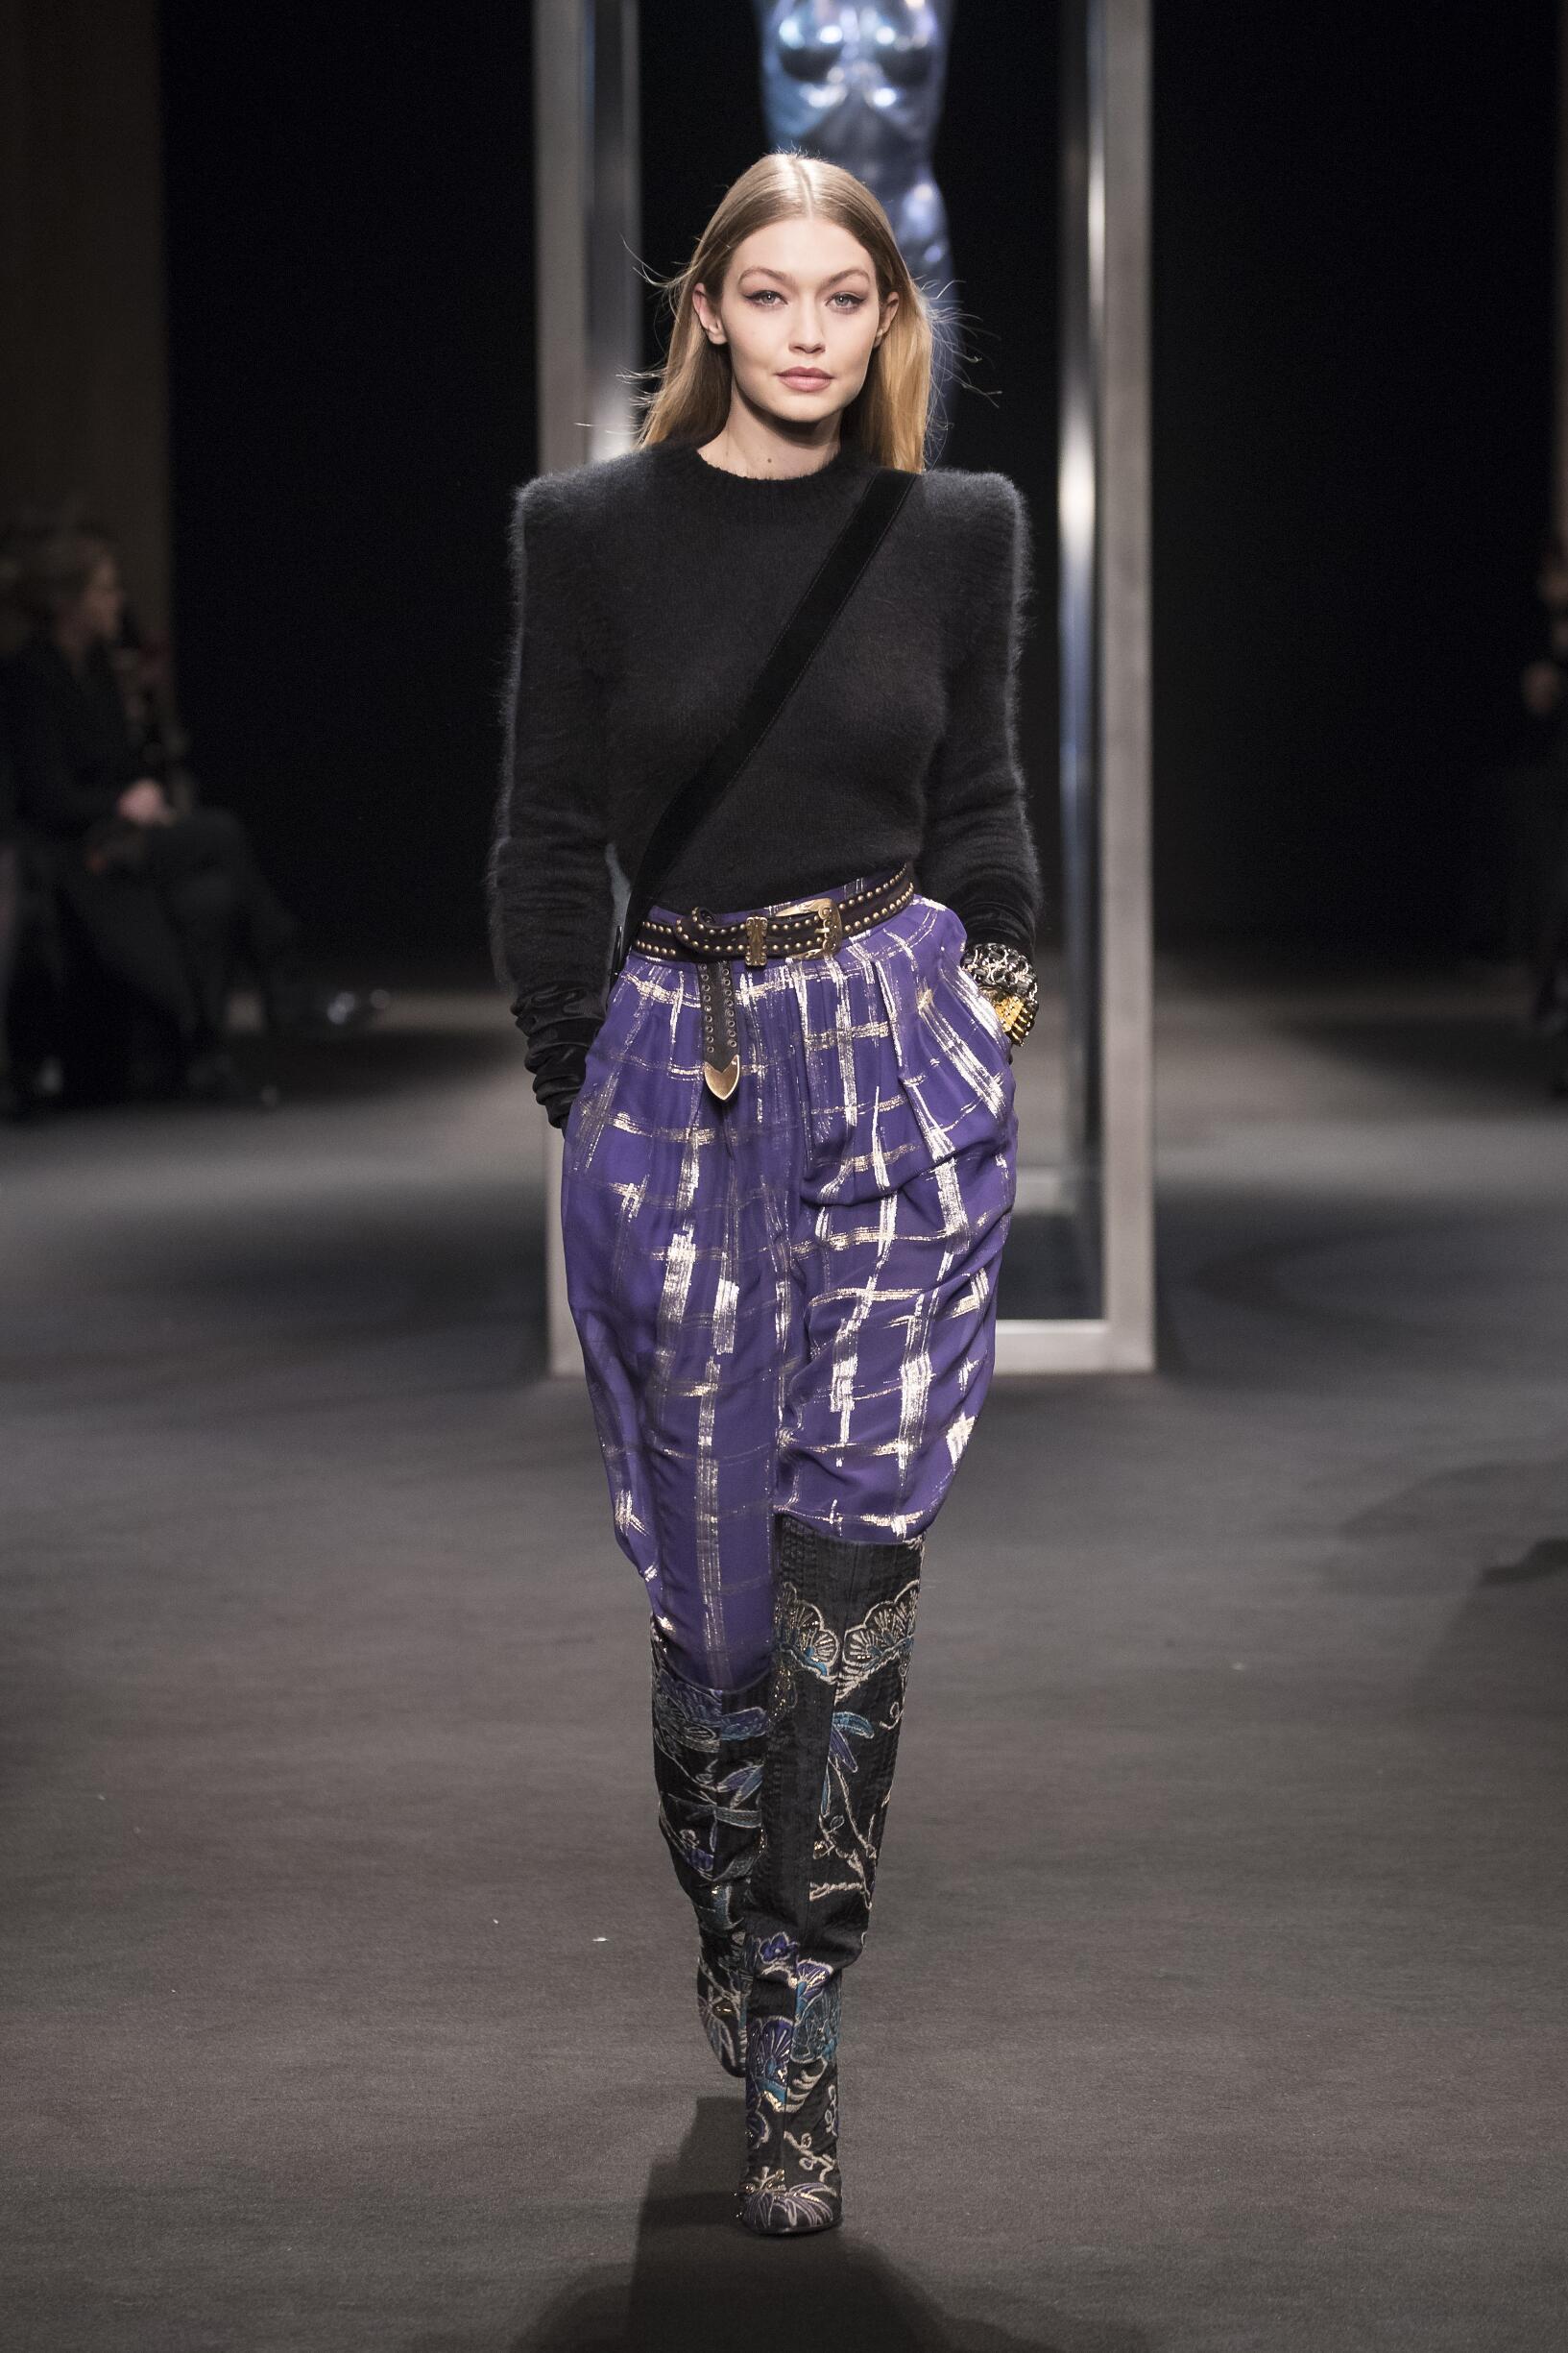 Alberta Ferretti Woman Style 2018